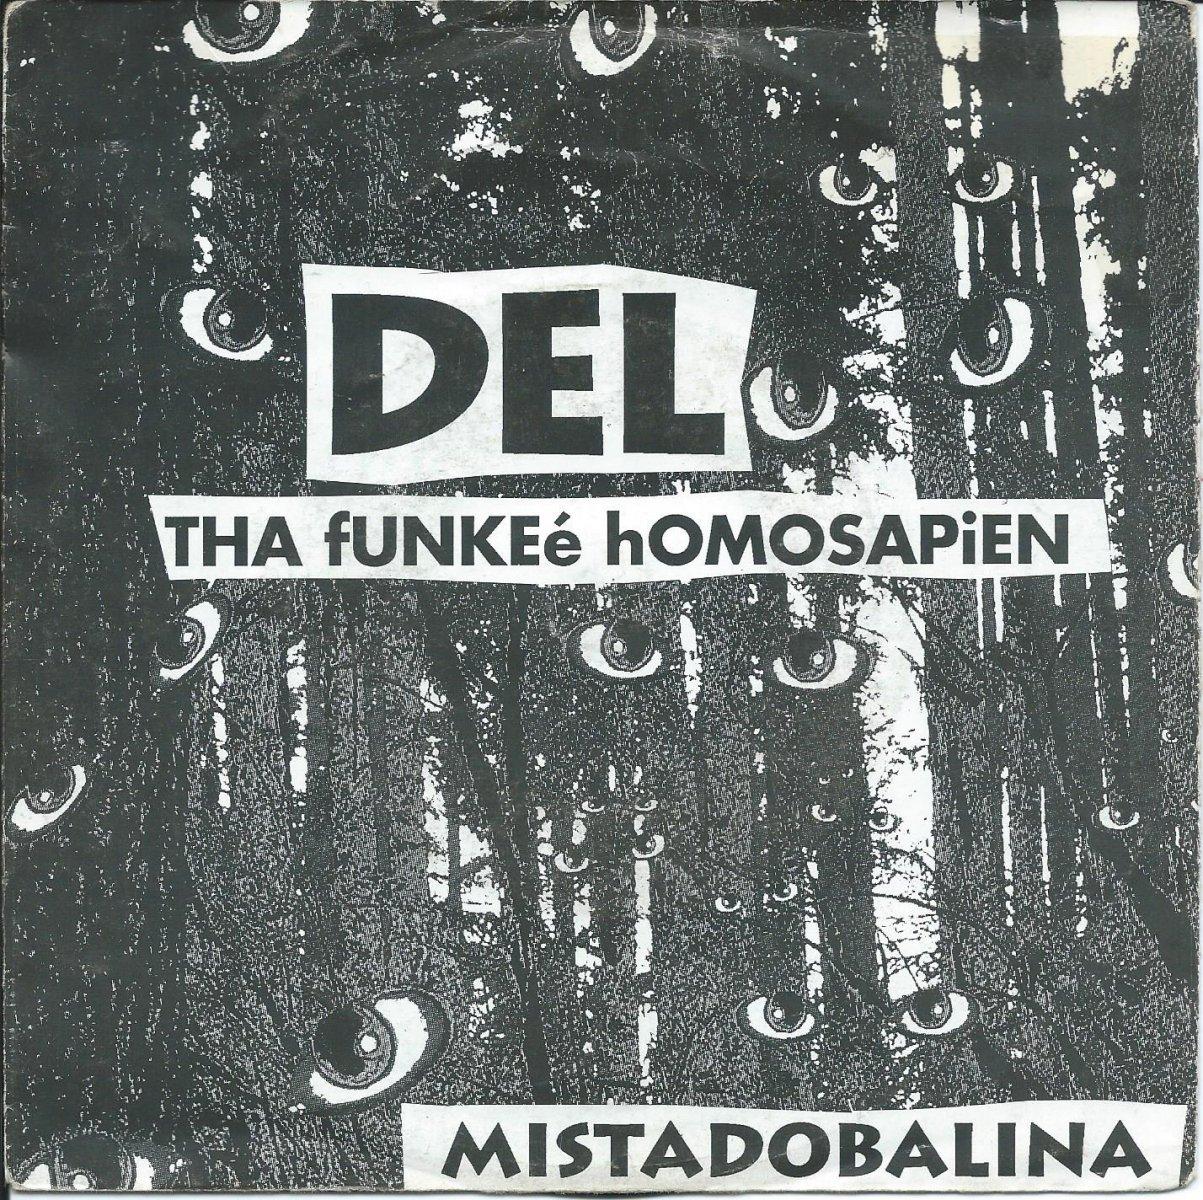 DEL THA FUNKEE HOMOSAPIEN / MISTADOBALINA (7